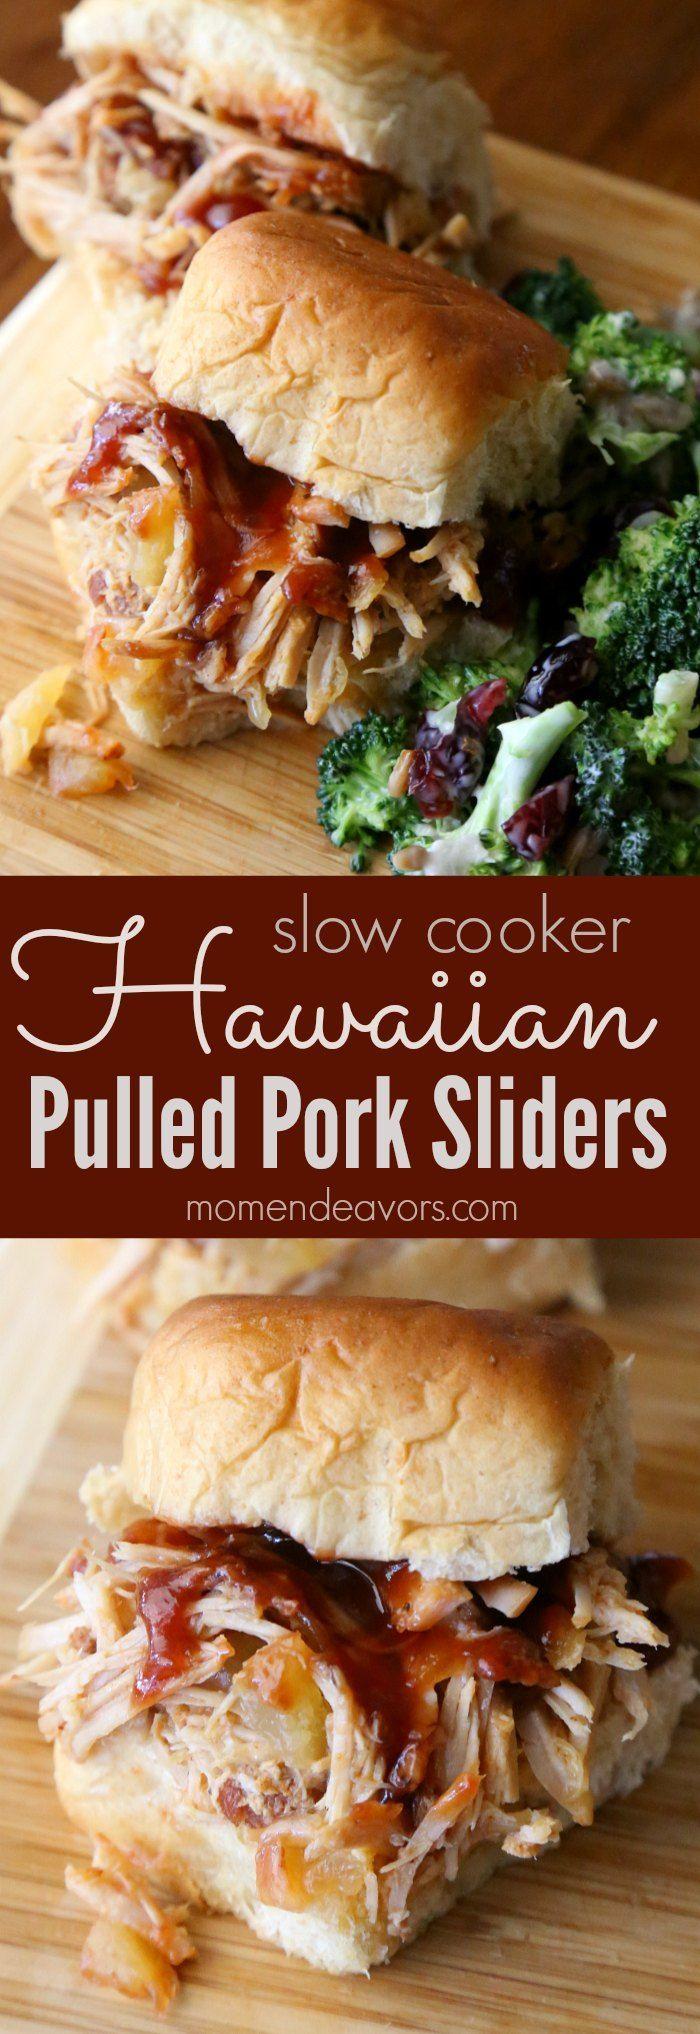 Slow Cooker Hawaiian Pulled Pork Sliders - so easy ...